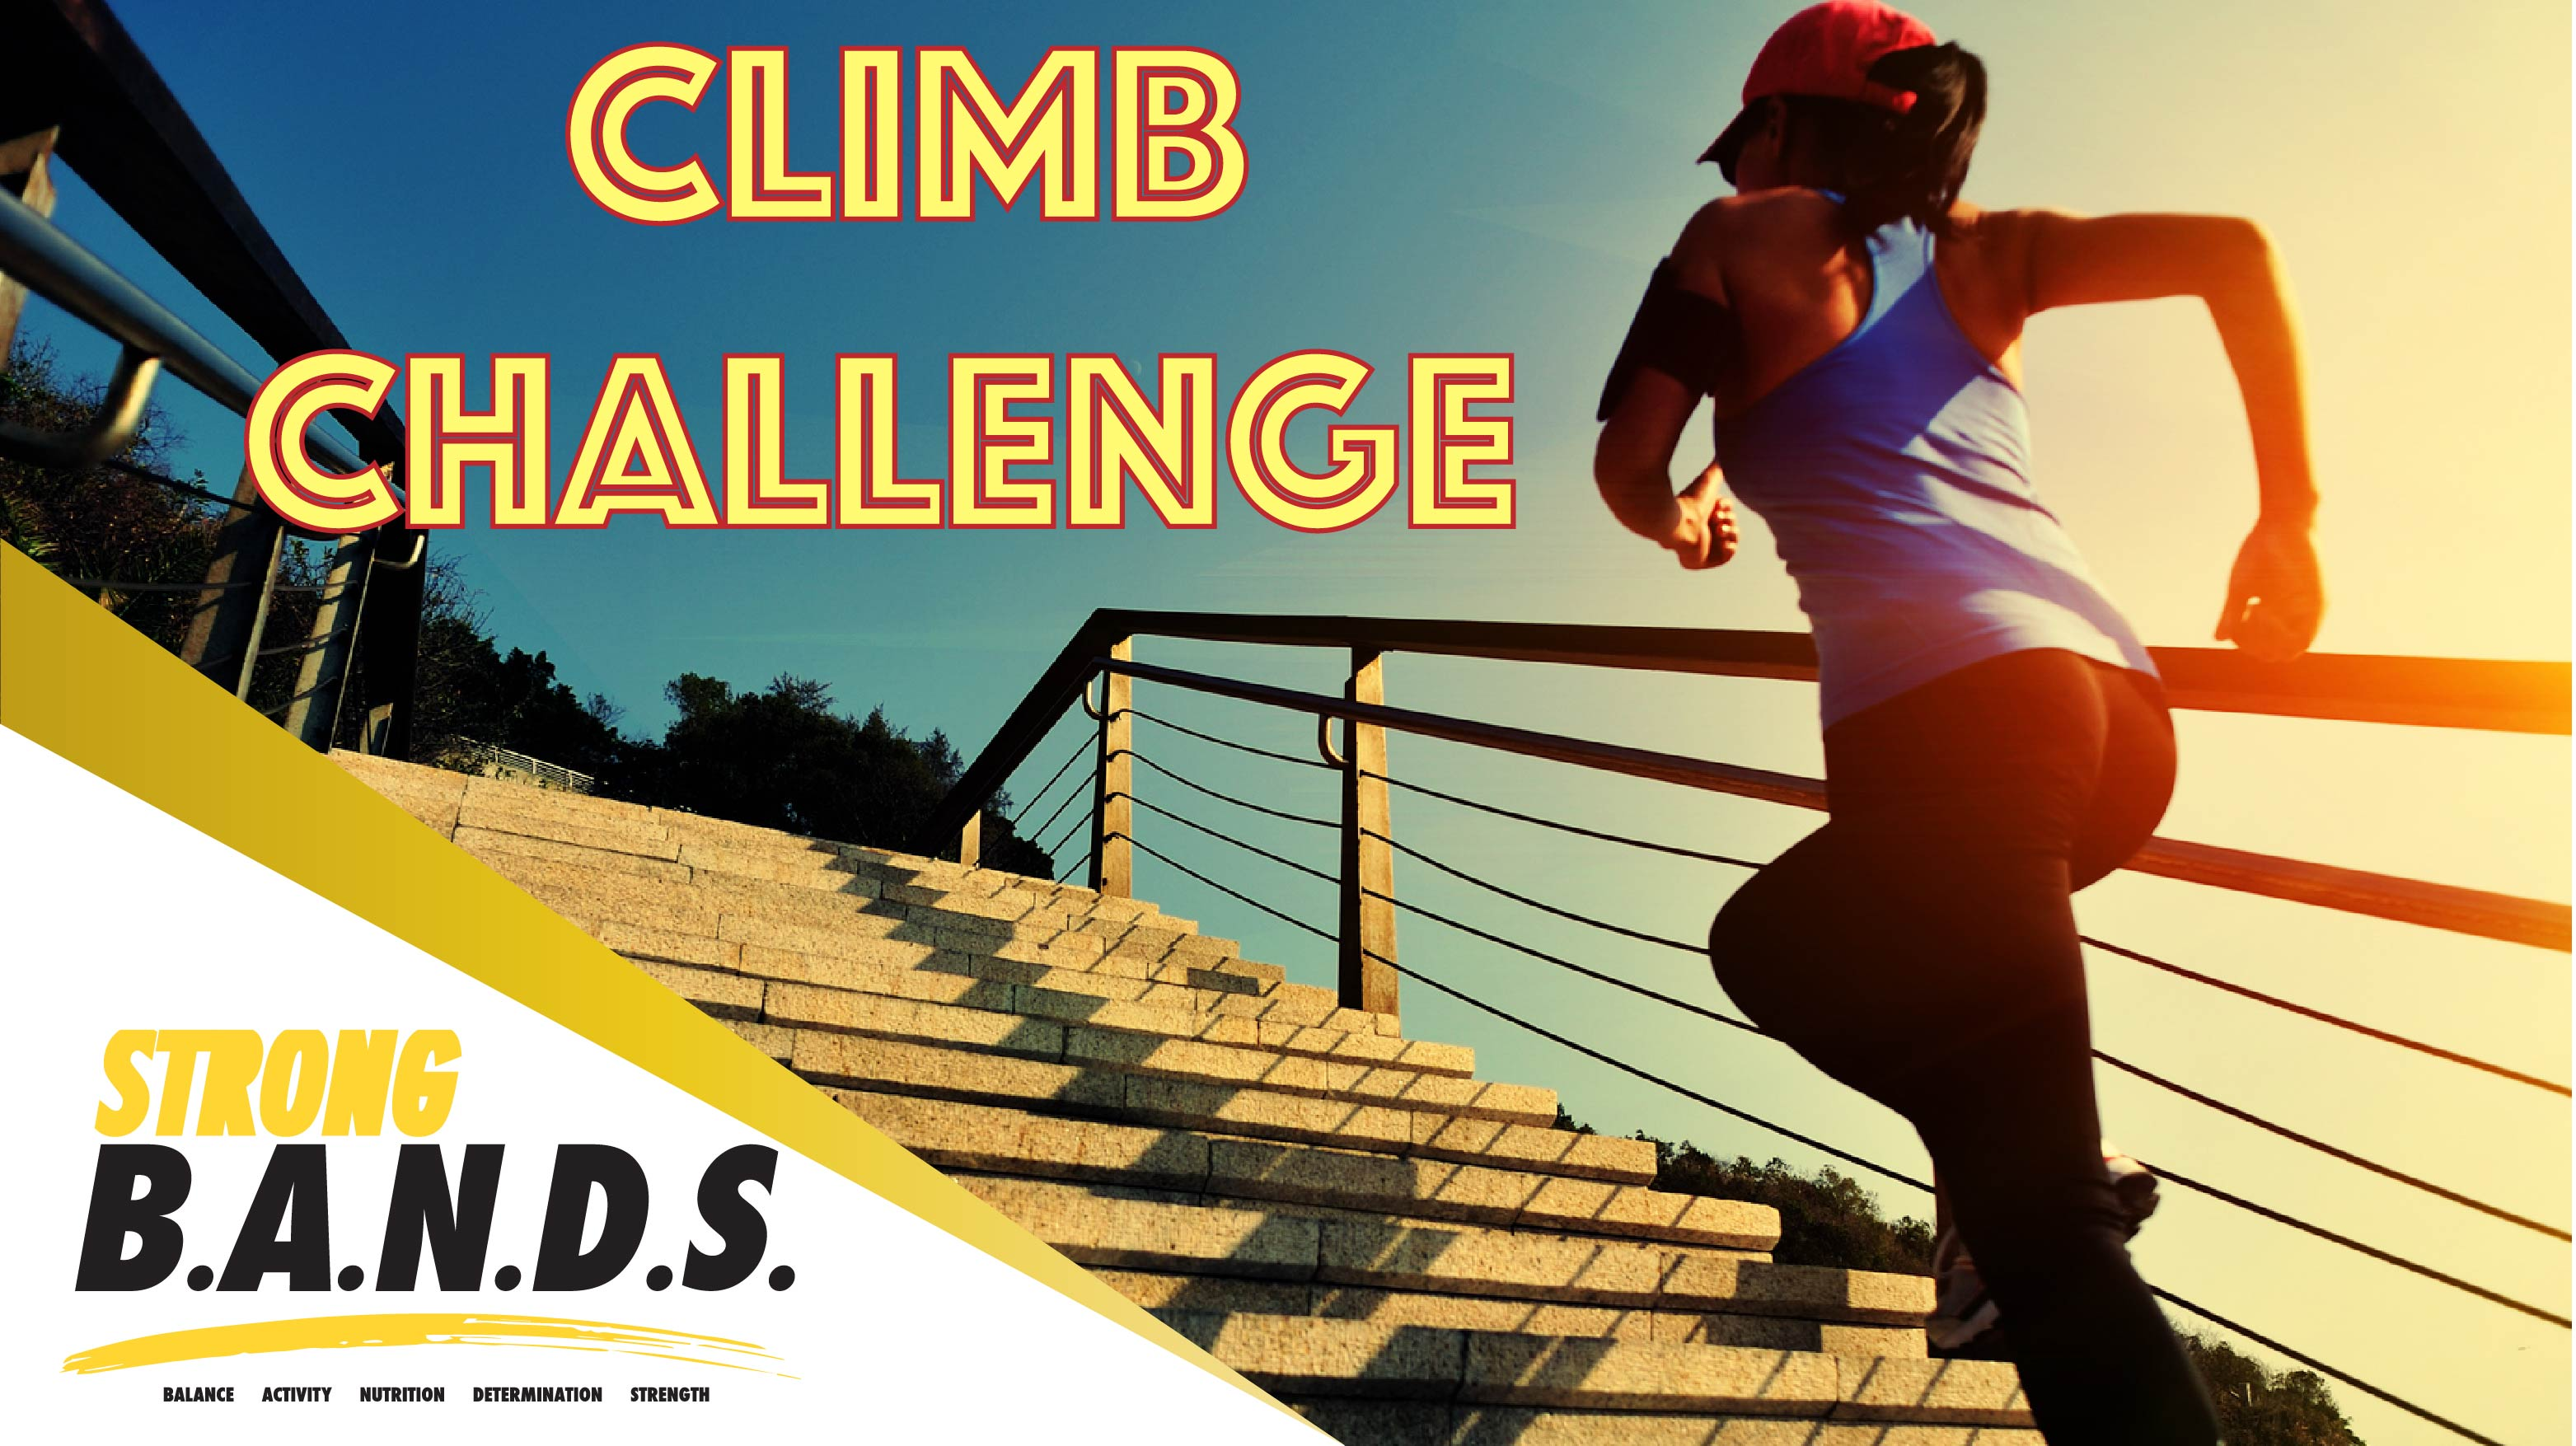 Strong B.A.N.D.S Climbing Challenge